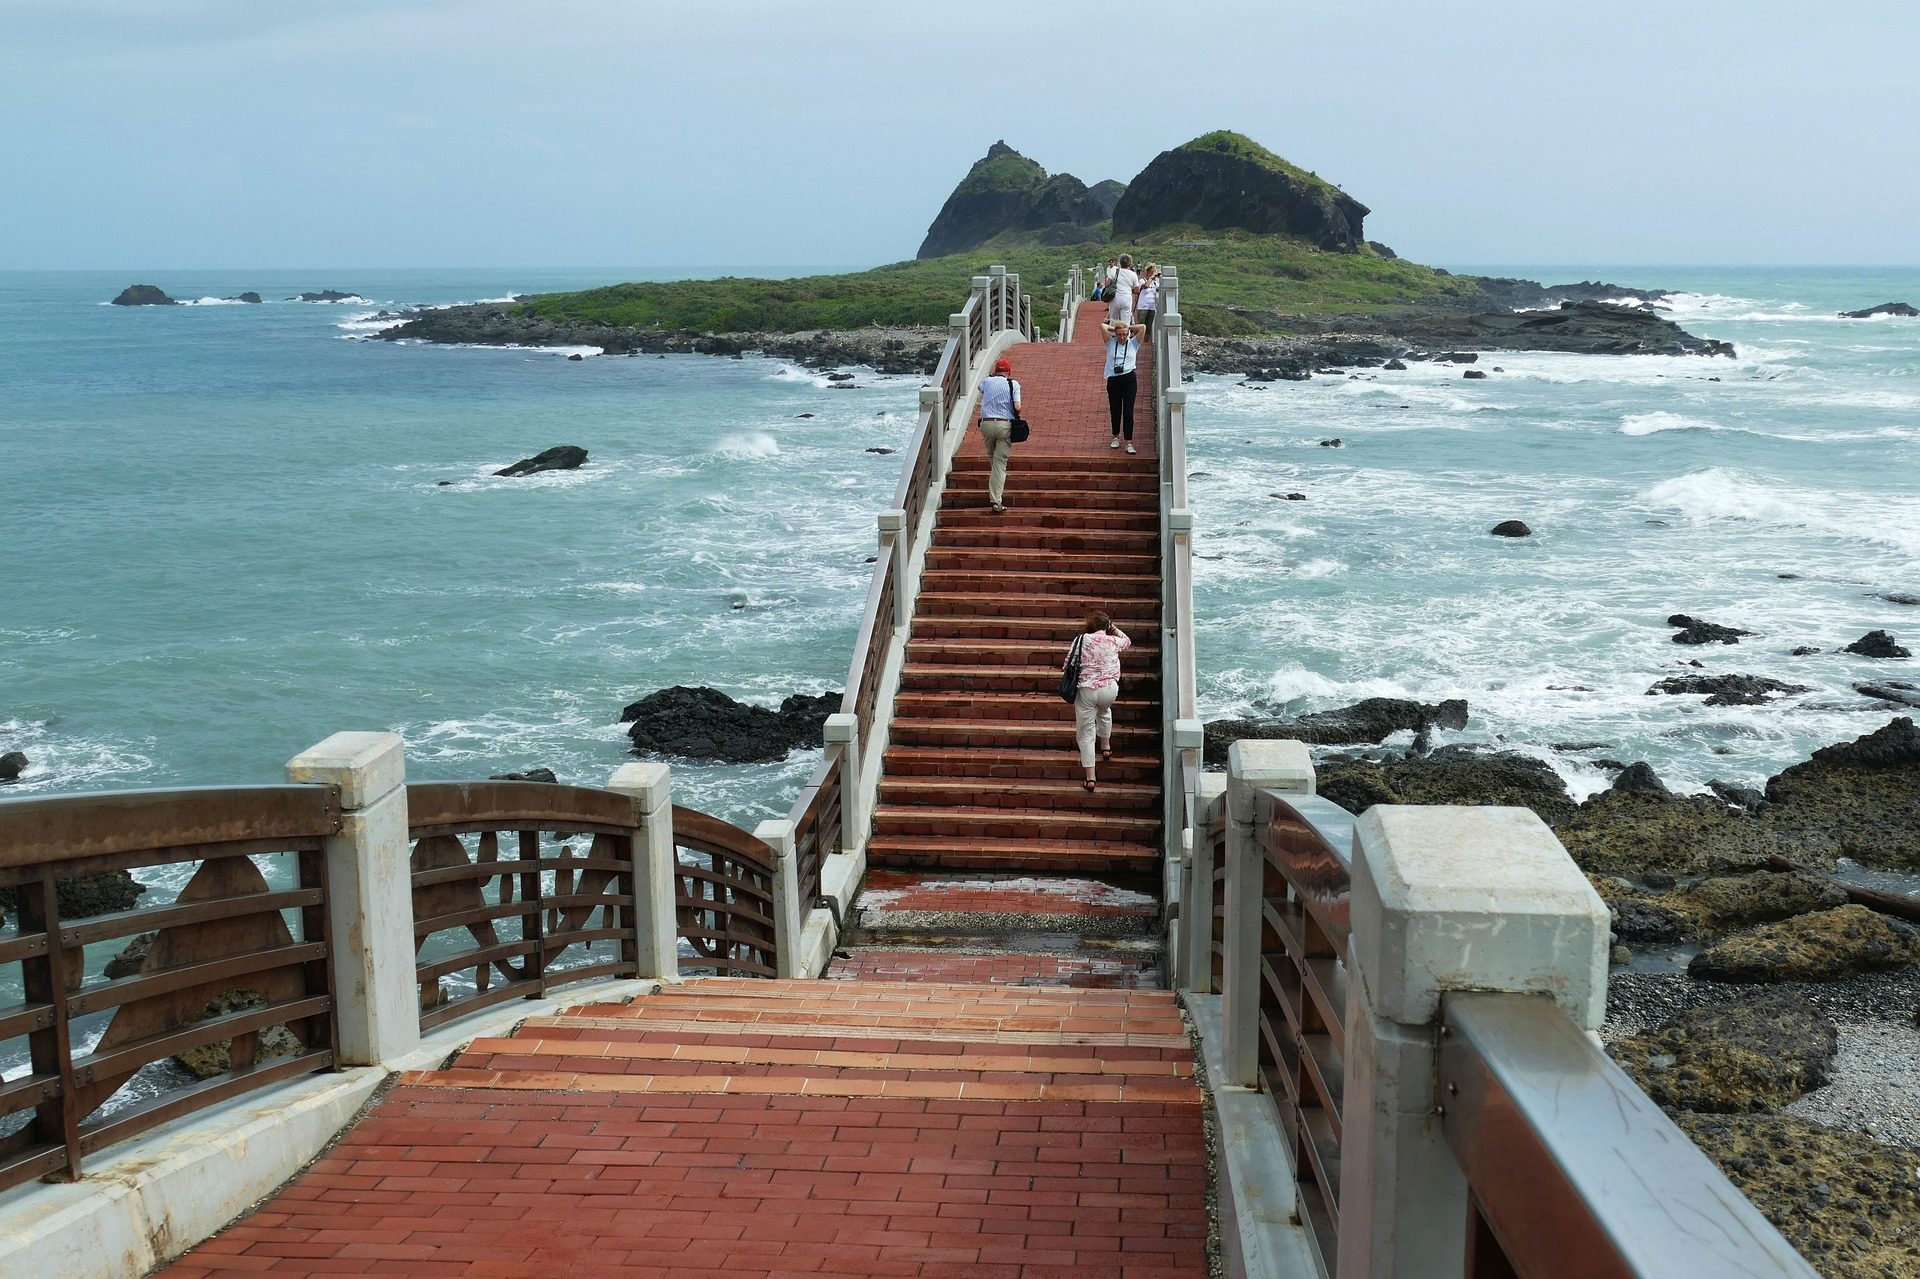 Brücke, Meer, Ozean, Pacífico, Sanxiantai, Taiwan - Wallpaper HD - Prof.-falken.com